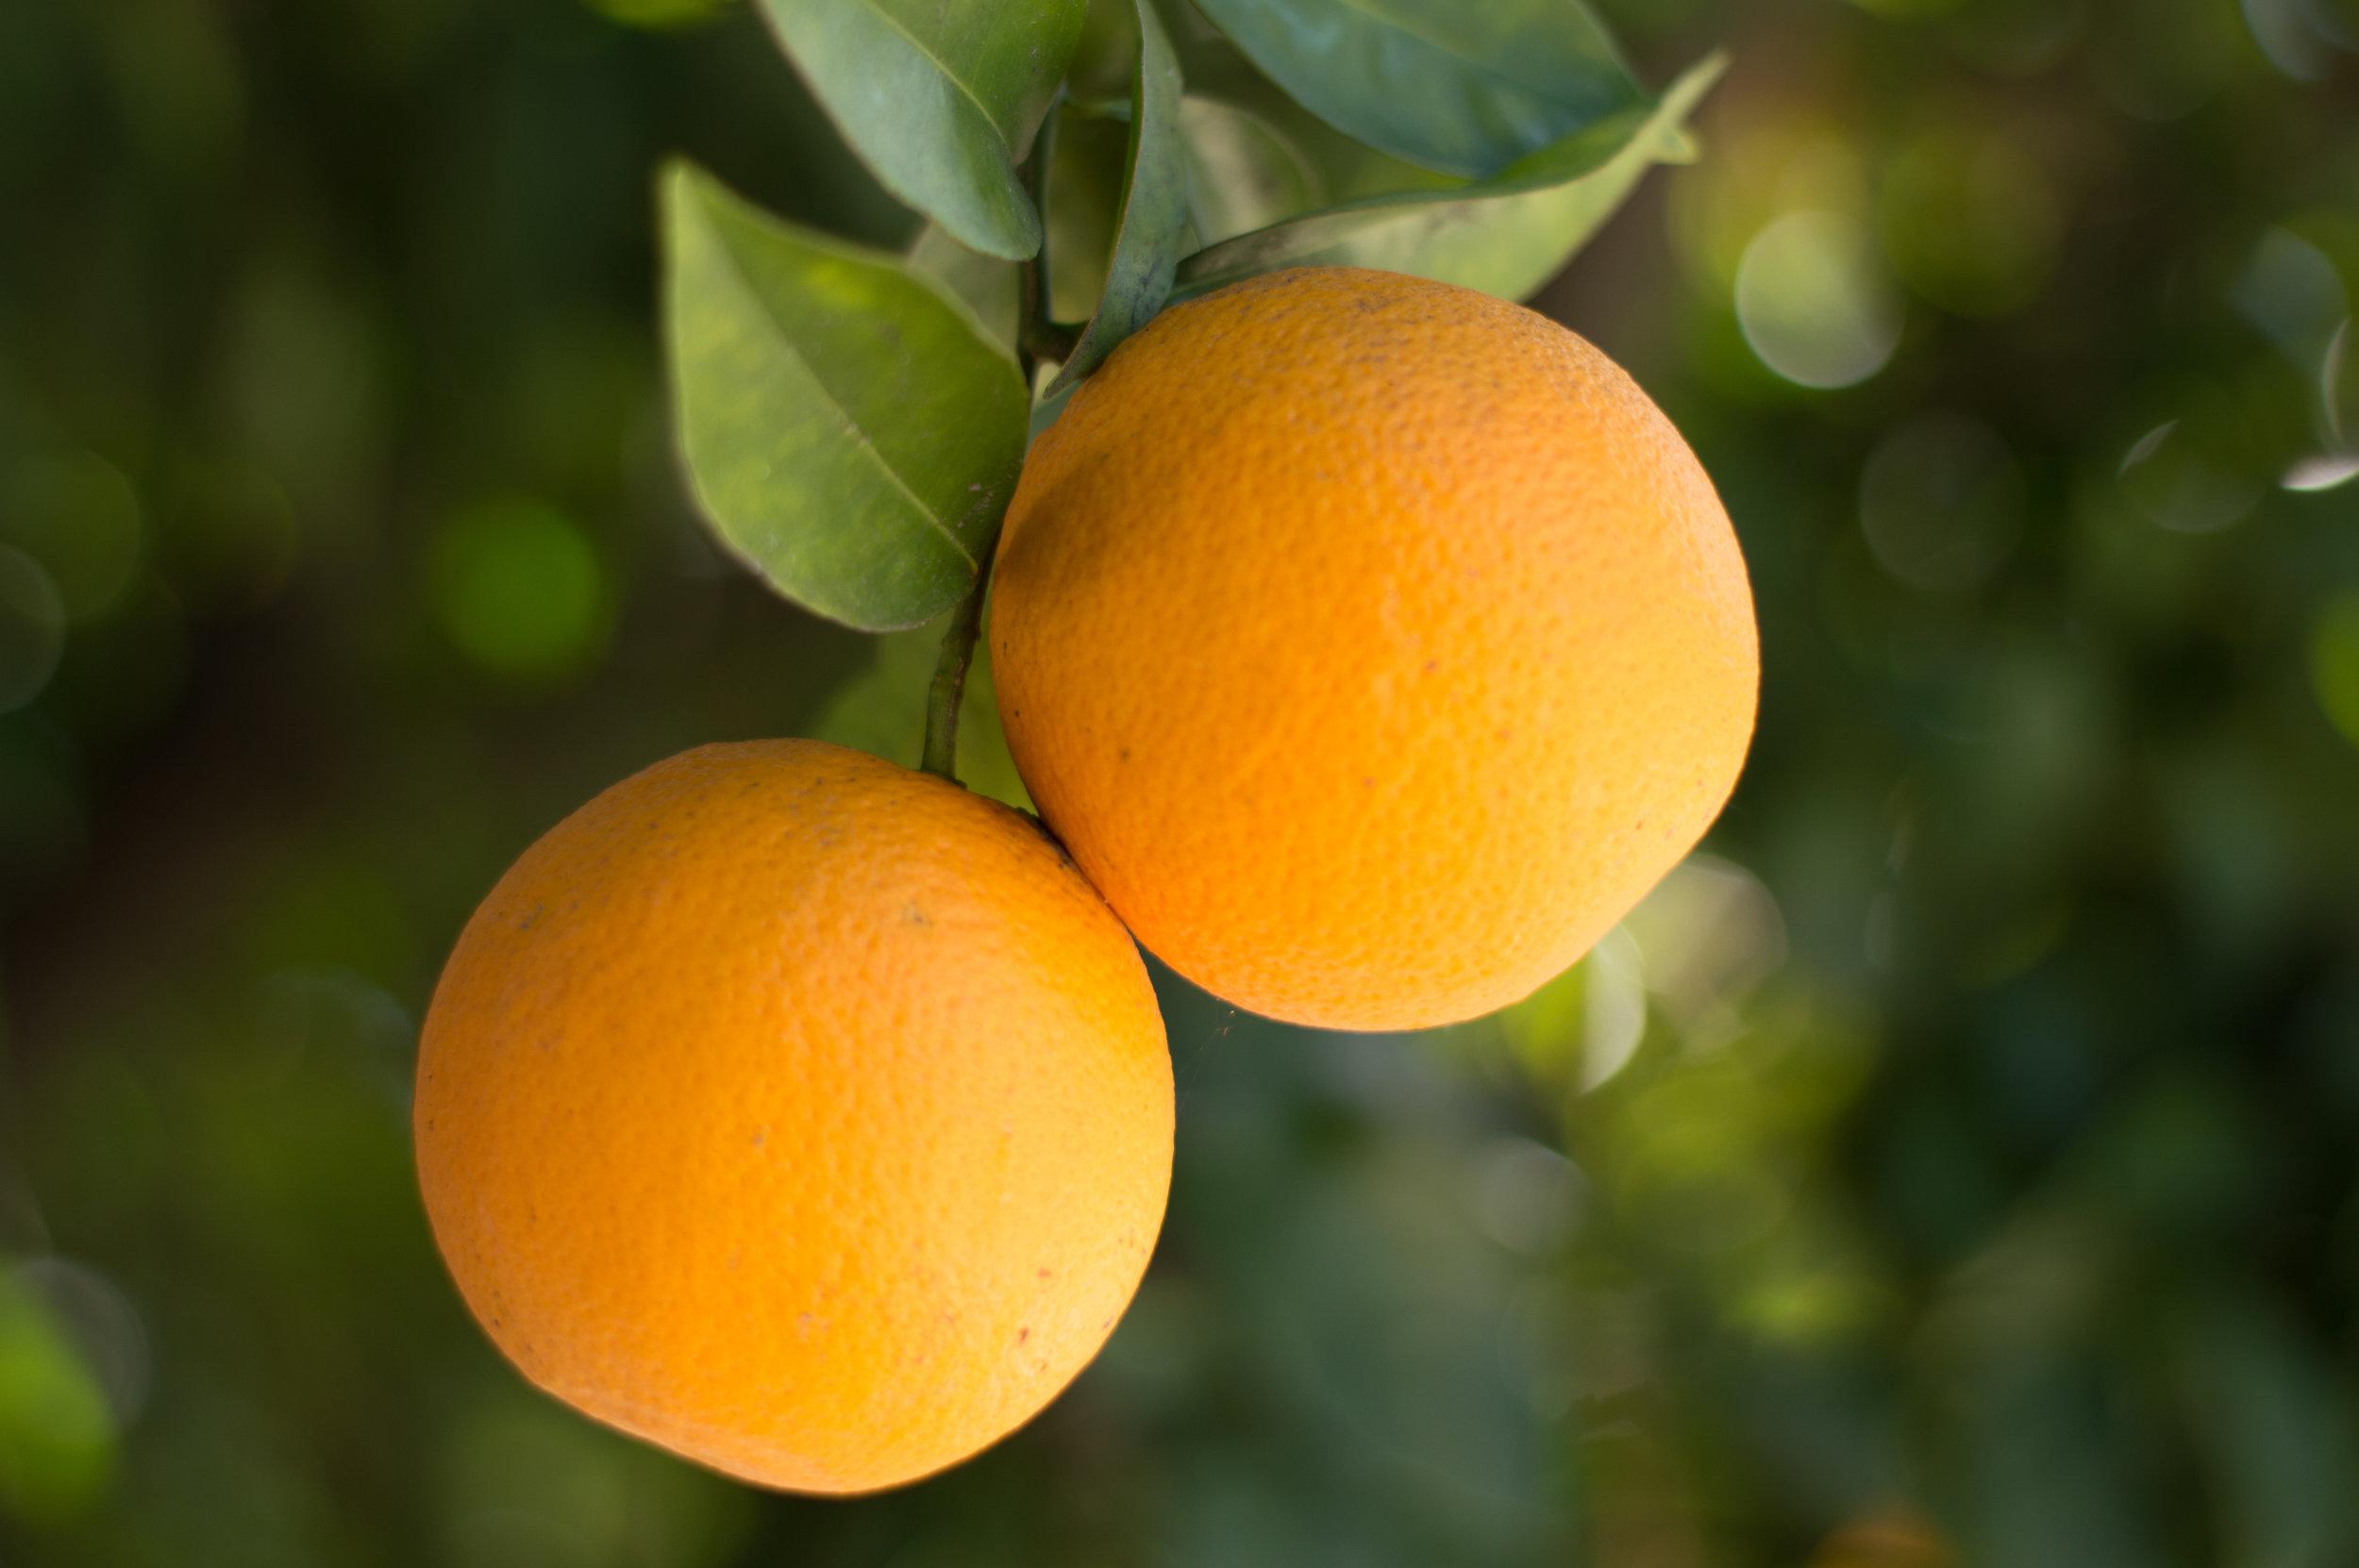 Oranges-.jpg